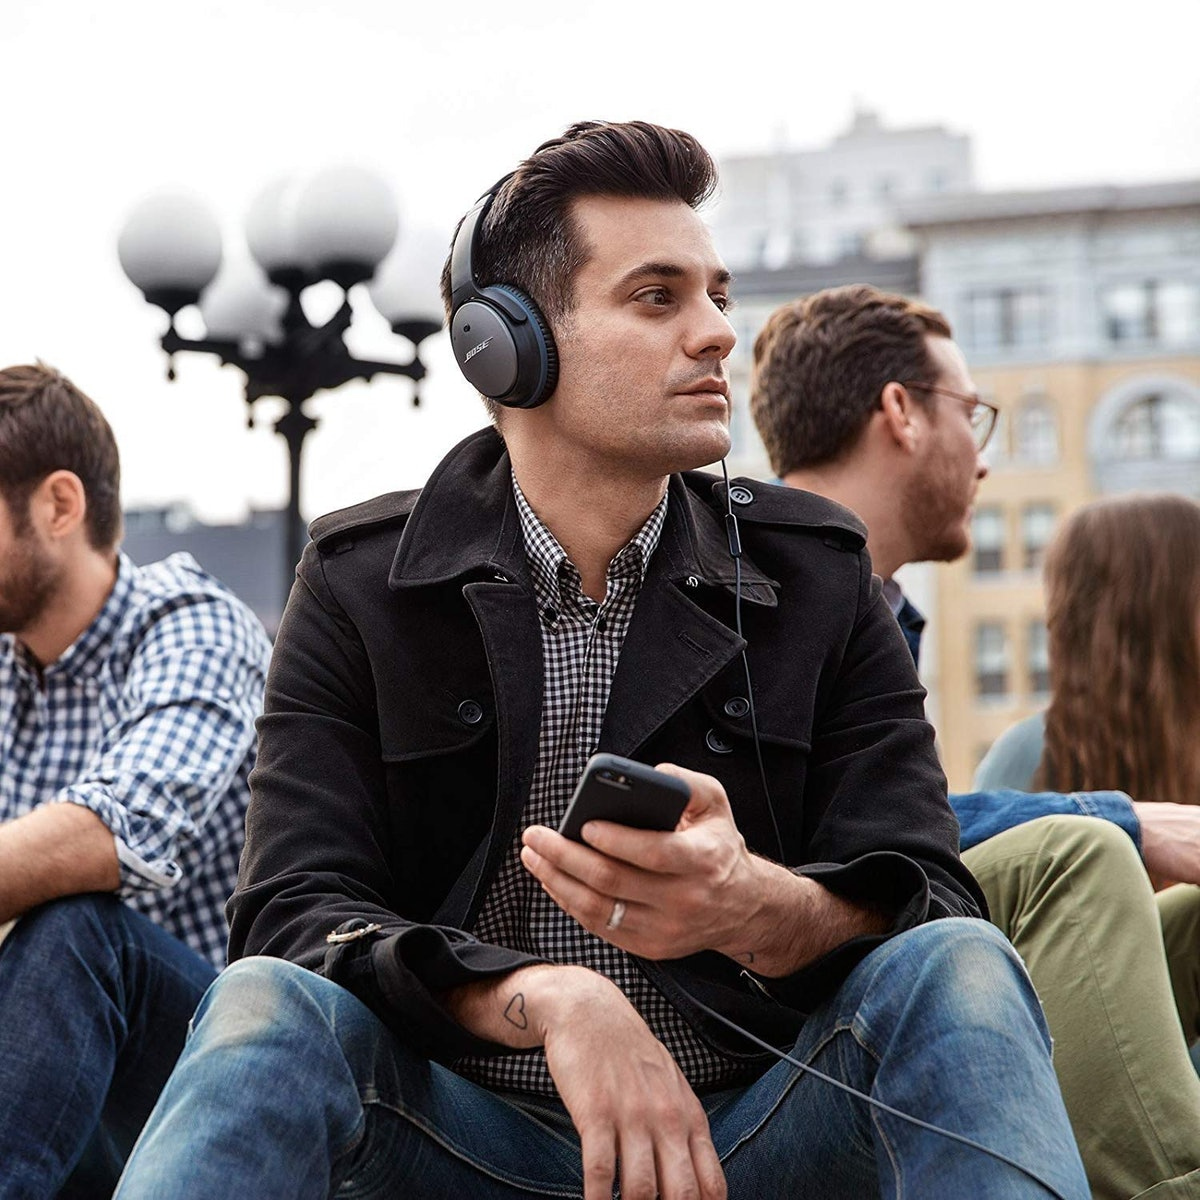 Bose QuietComfort Noise-Canceling Headphones